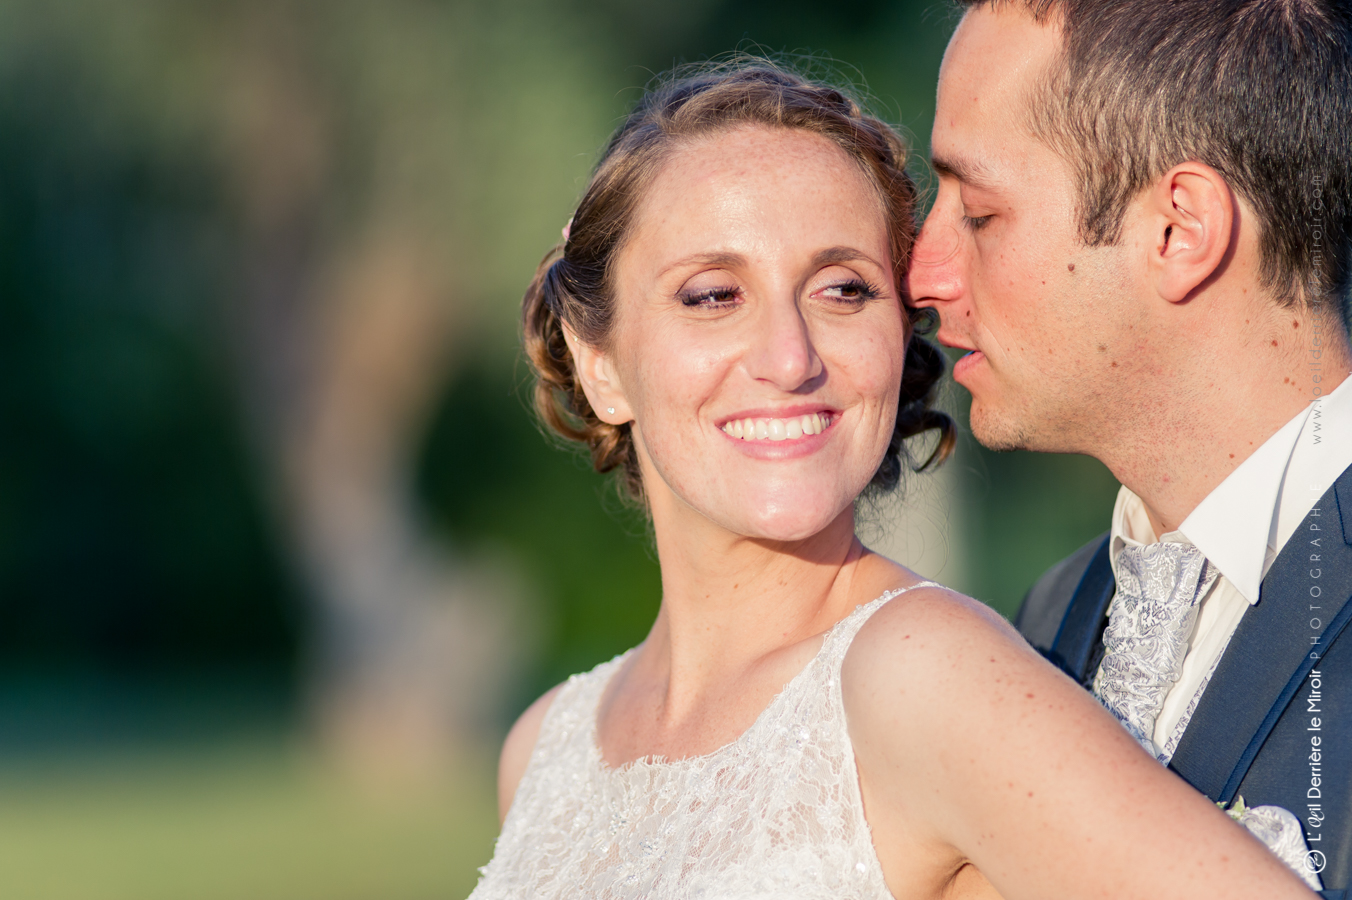 mariage-cj-vaugrenier-loeilderrierelemiroir-063